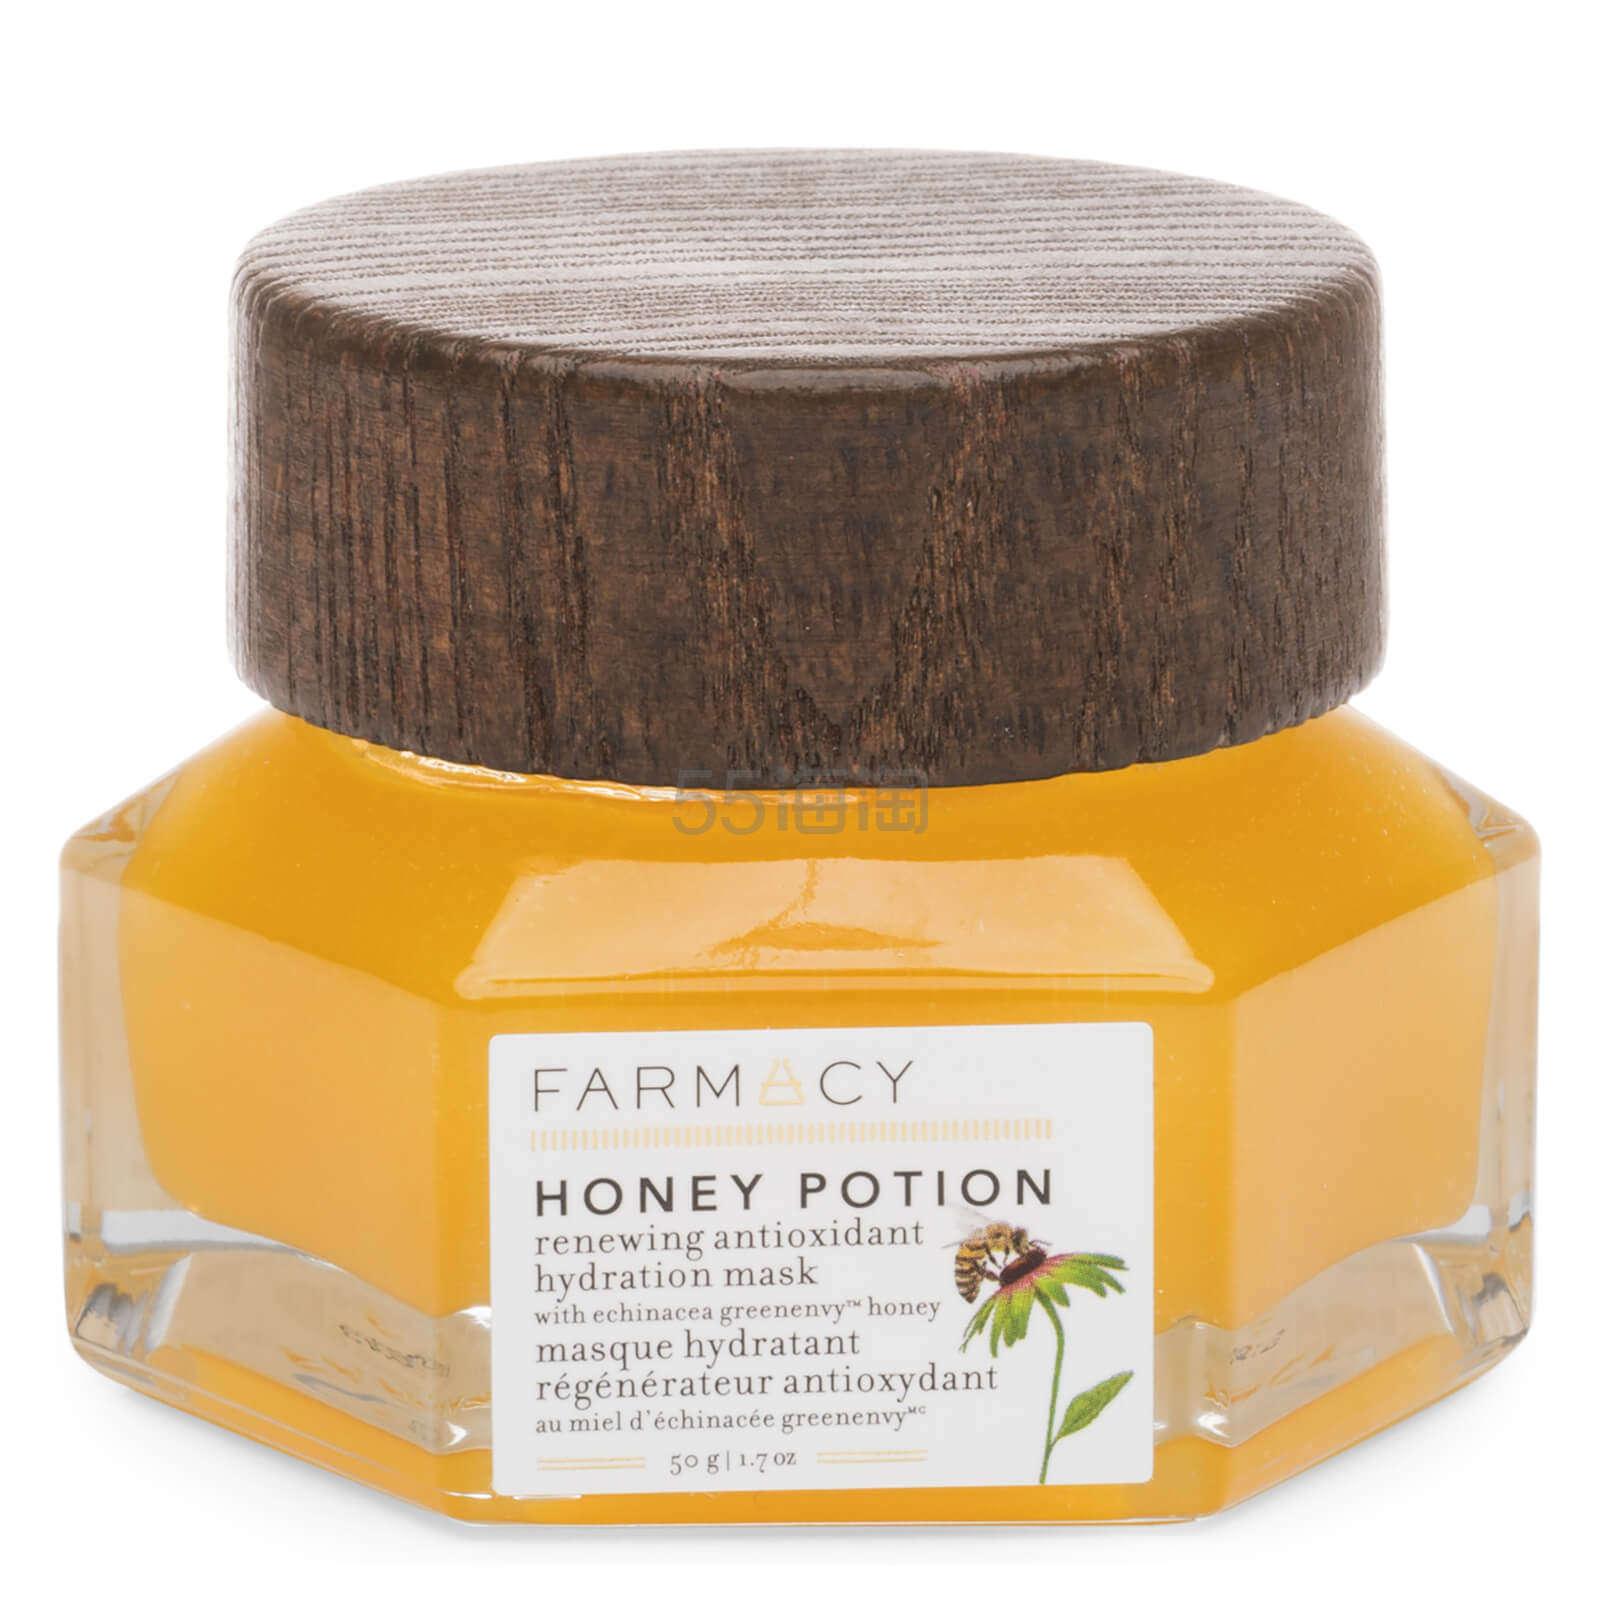 满3件享6.7折!FARMACY Honey Potion 蜂蜜焕彩补水面膜 50g